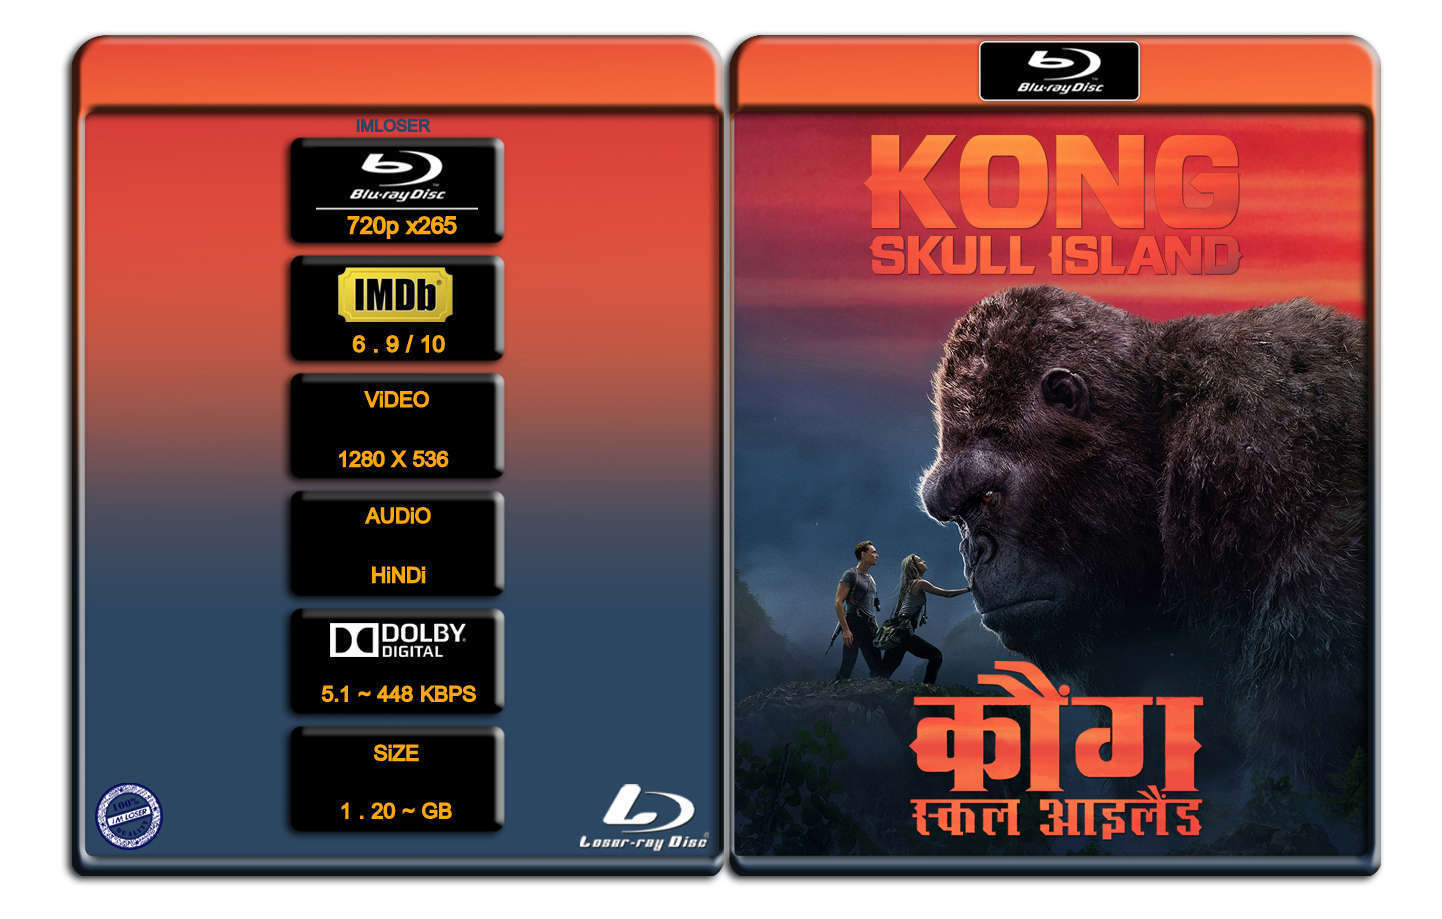 Kong Skull Island [2017] 720p BluRay x265 [DD 5 1 HINDI] ® I'm Loser ®